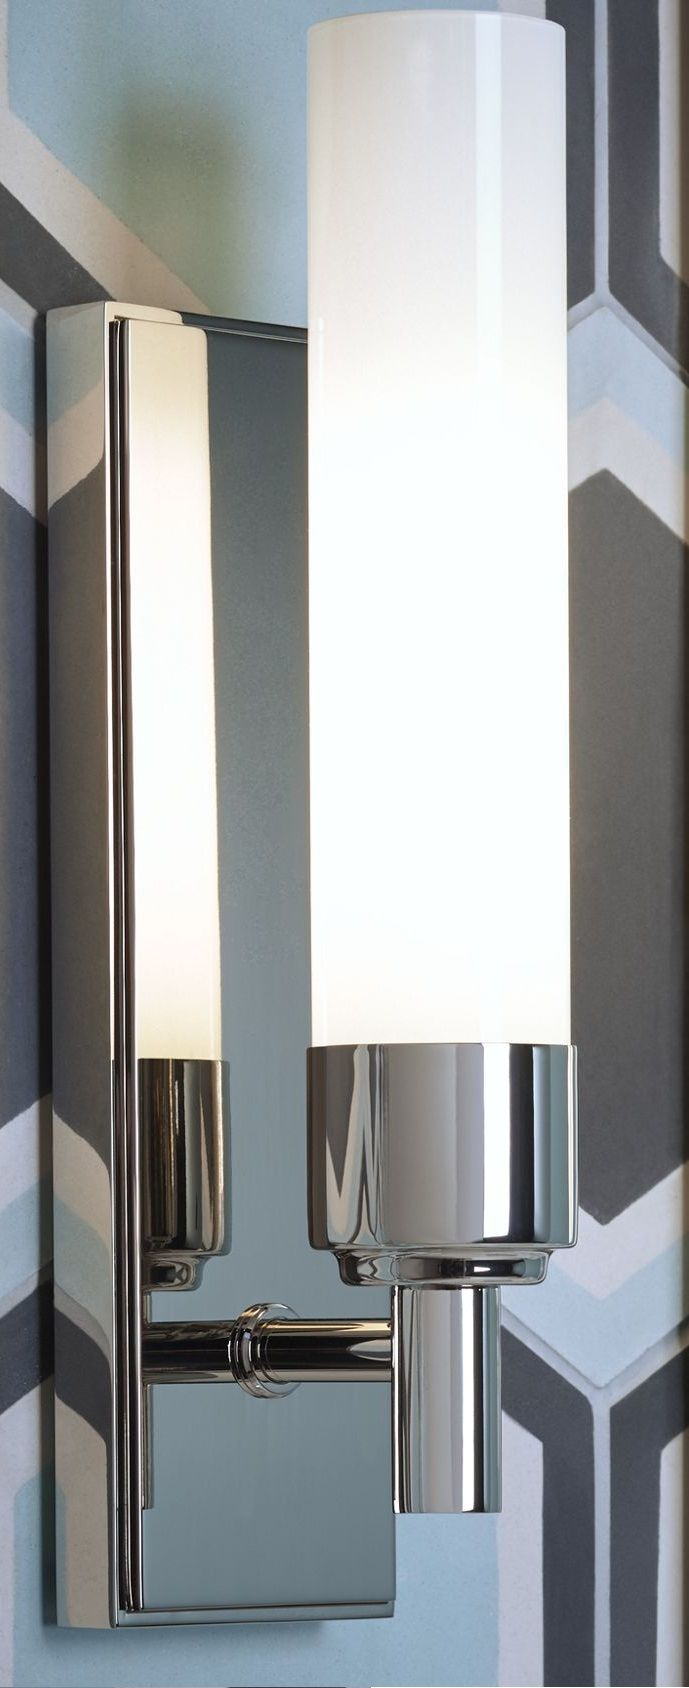 Robern Bathroom Sconces robern dlfml77 polished nickel main line single light wall sconce